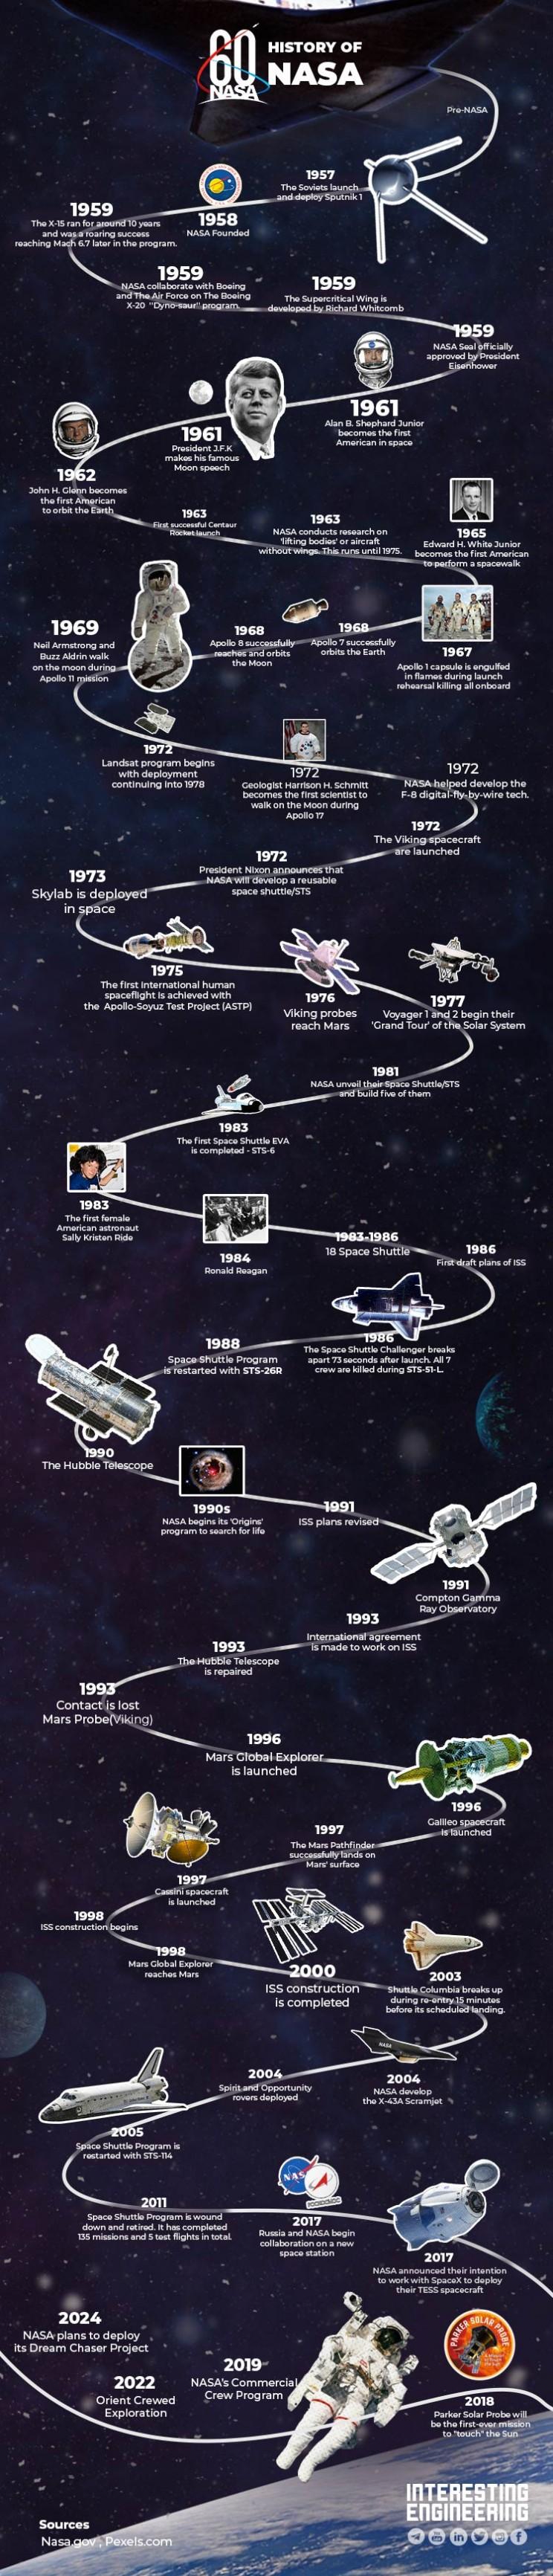 NASA history timeline infographic 60 years birthday